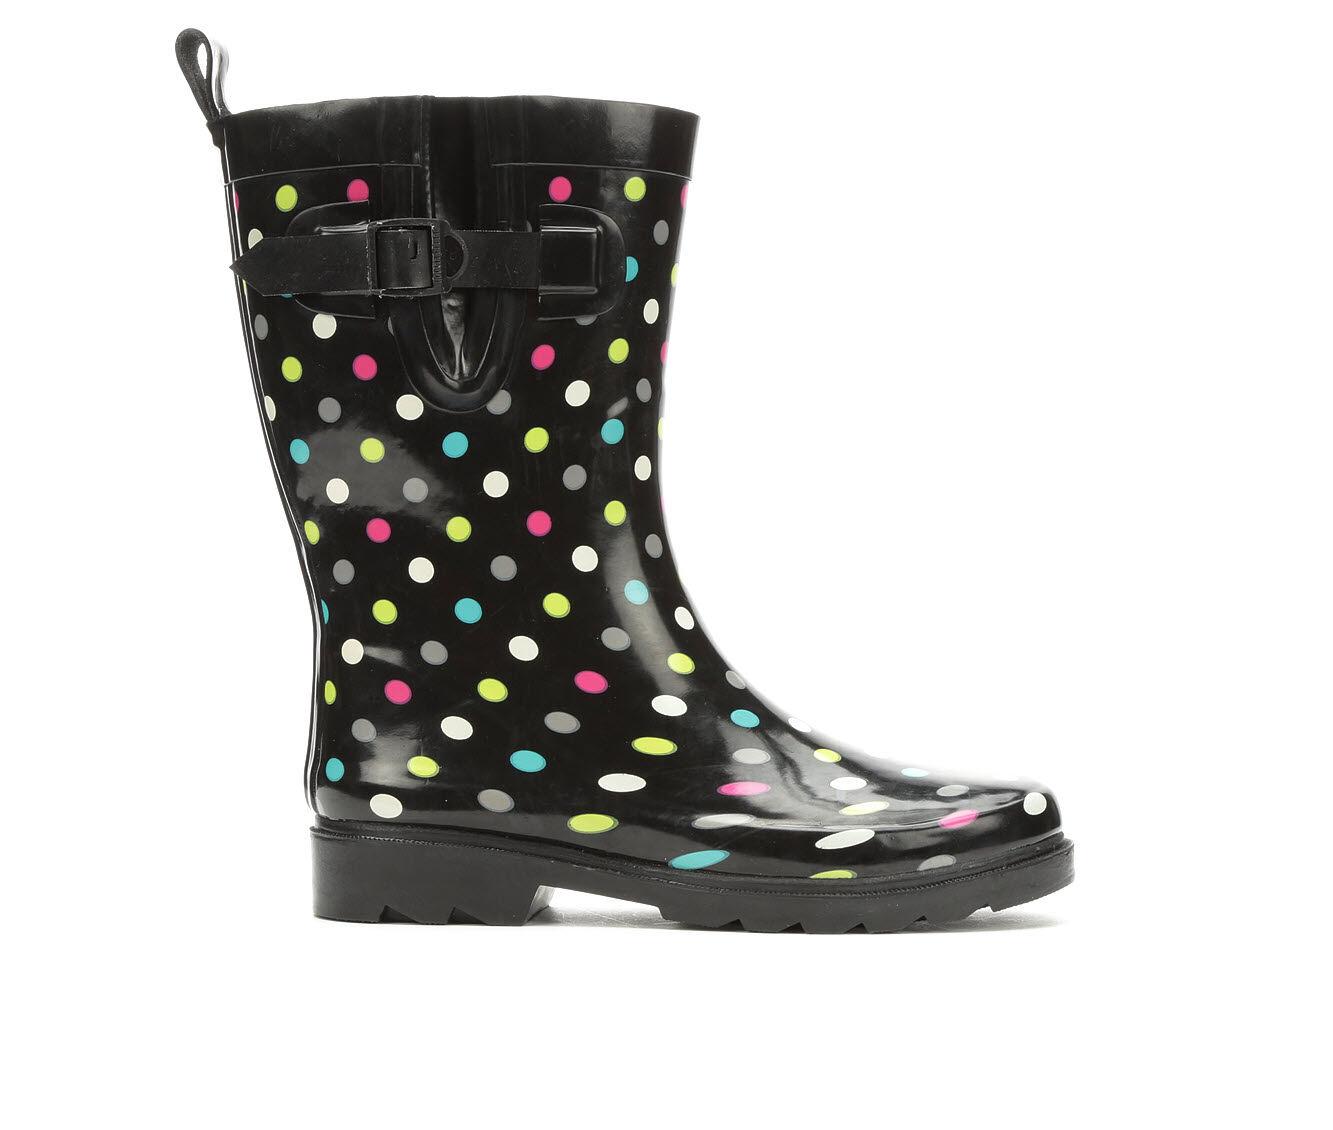 Women's Capelli New York Shiny Multi Dots Mid Rain Boots Multi Rainbow